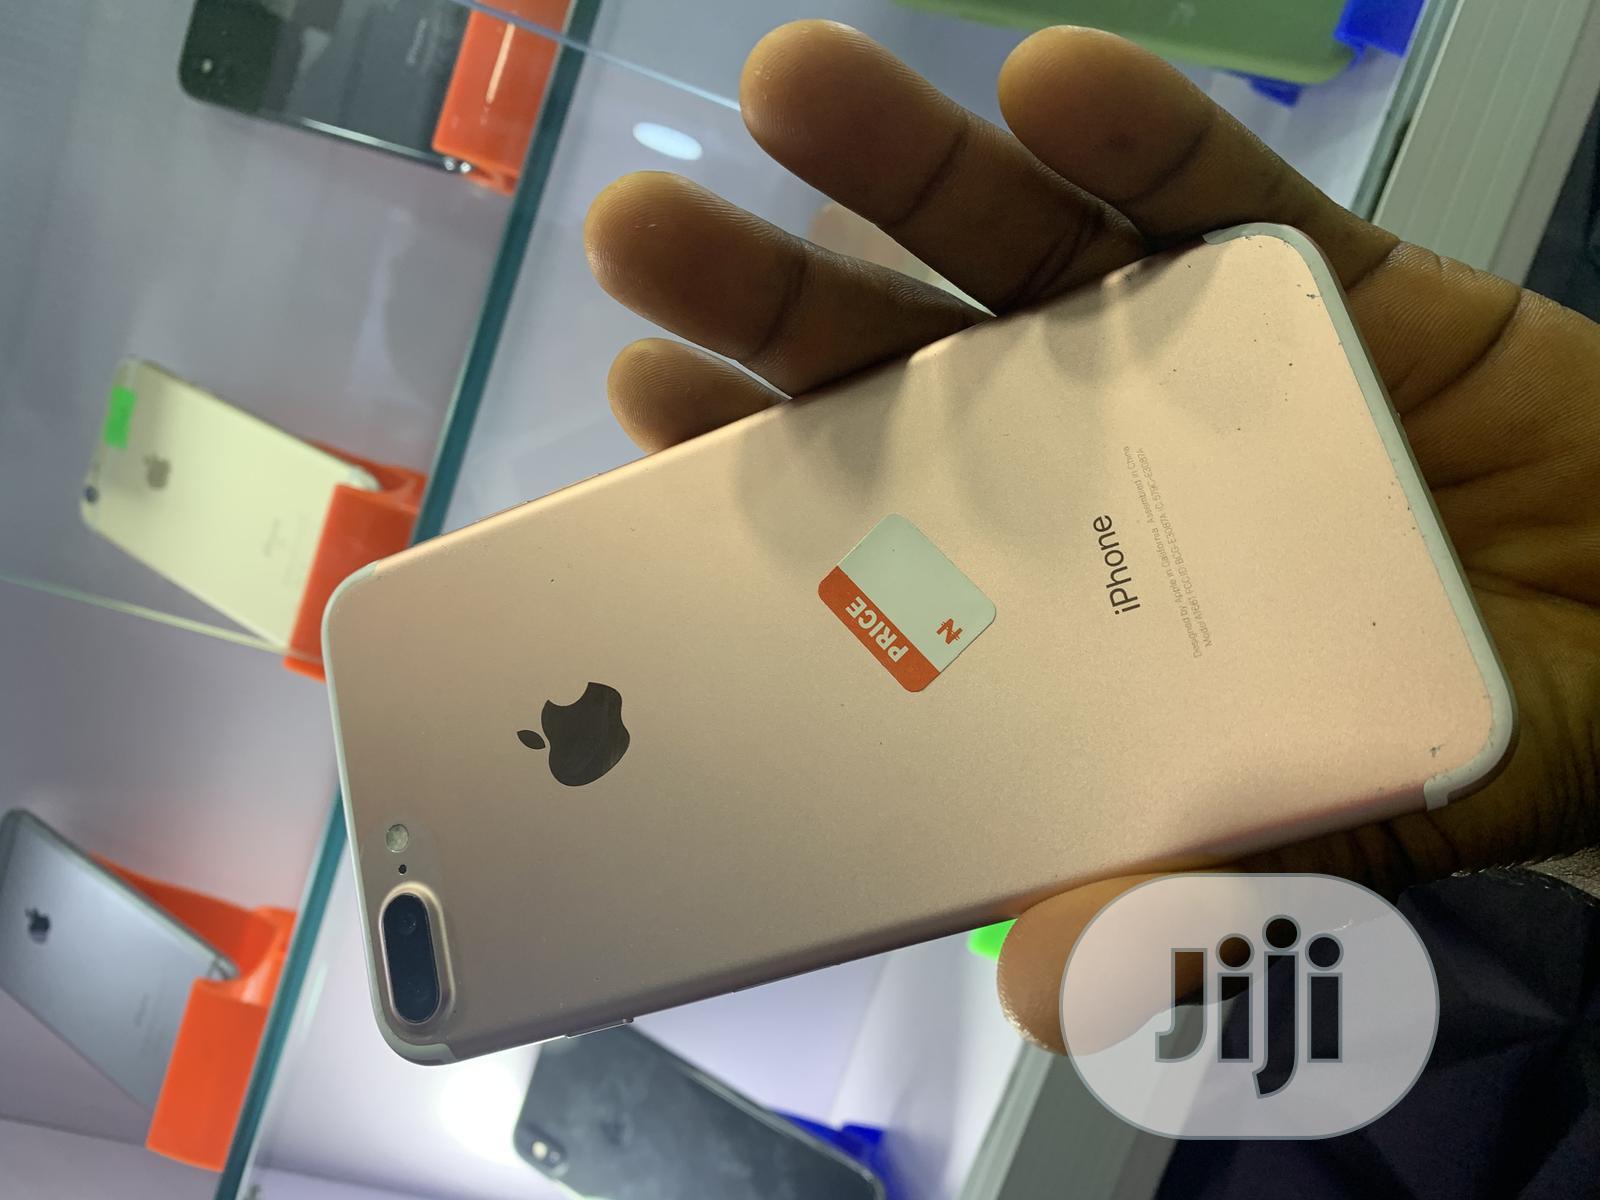 Apple iPhone 7 Plus 256 GB Gold | Mobile Phones for sale in Ikeja, Lagos State, Nigeria